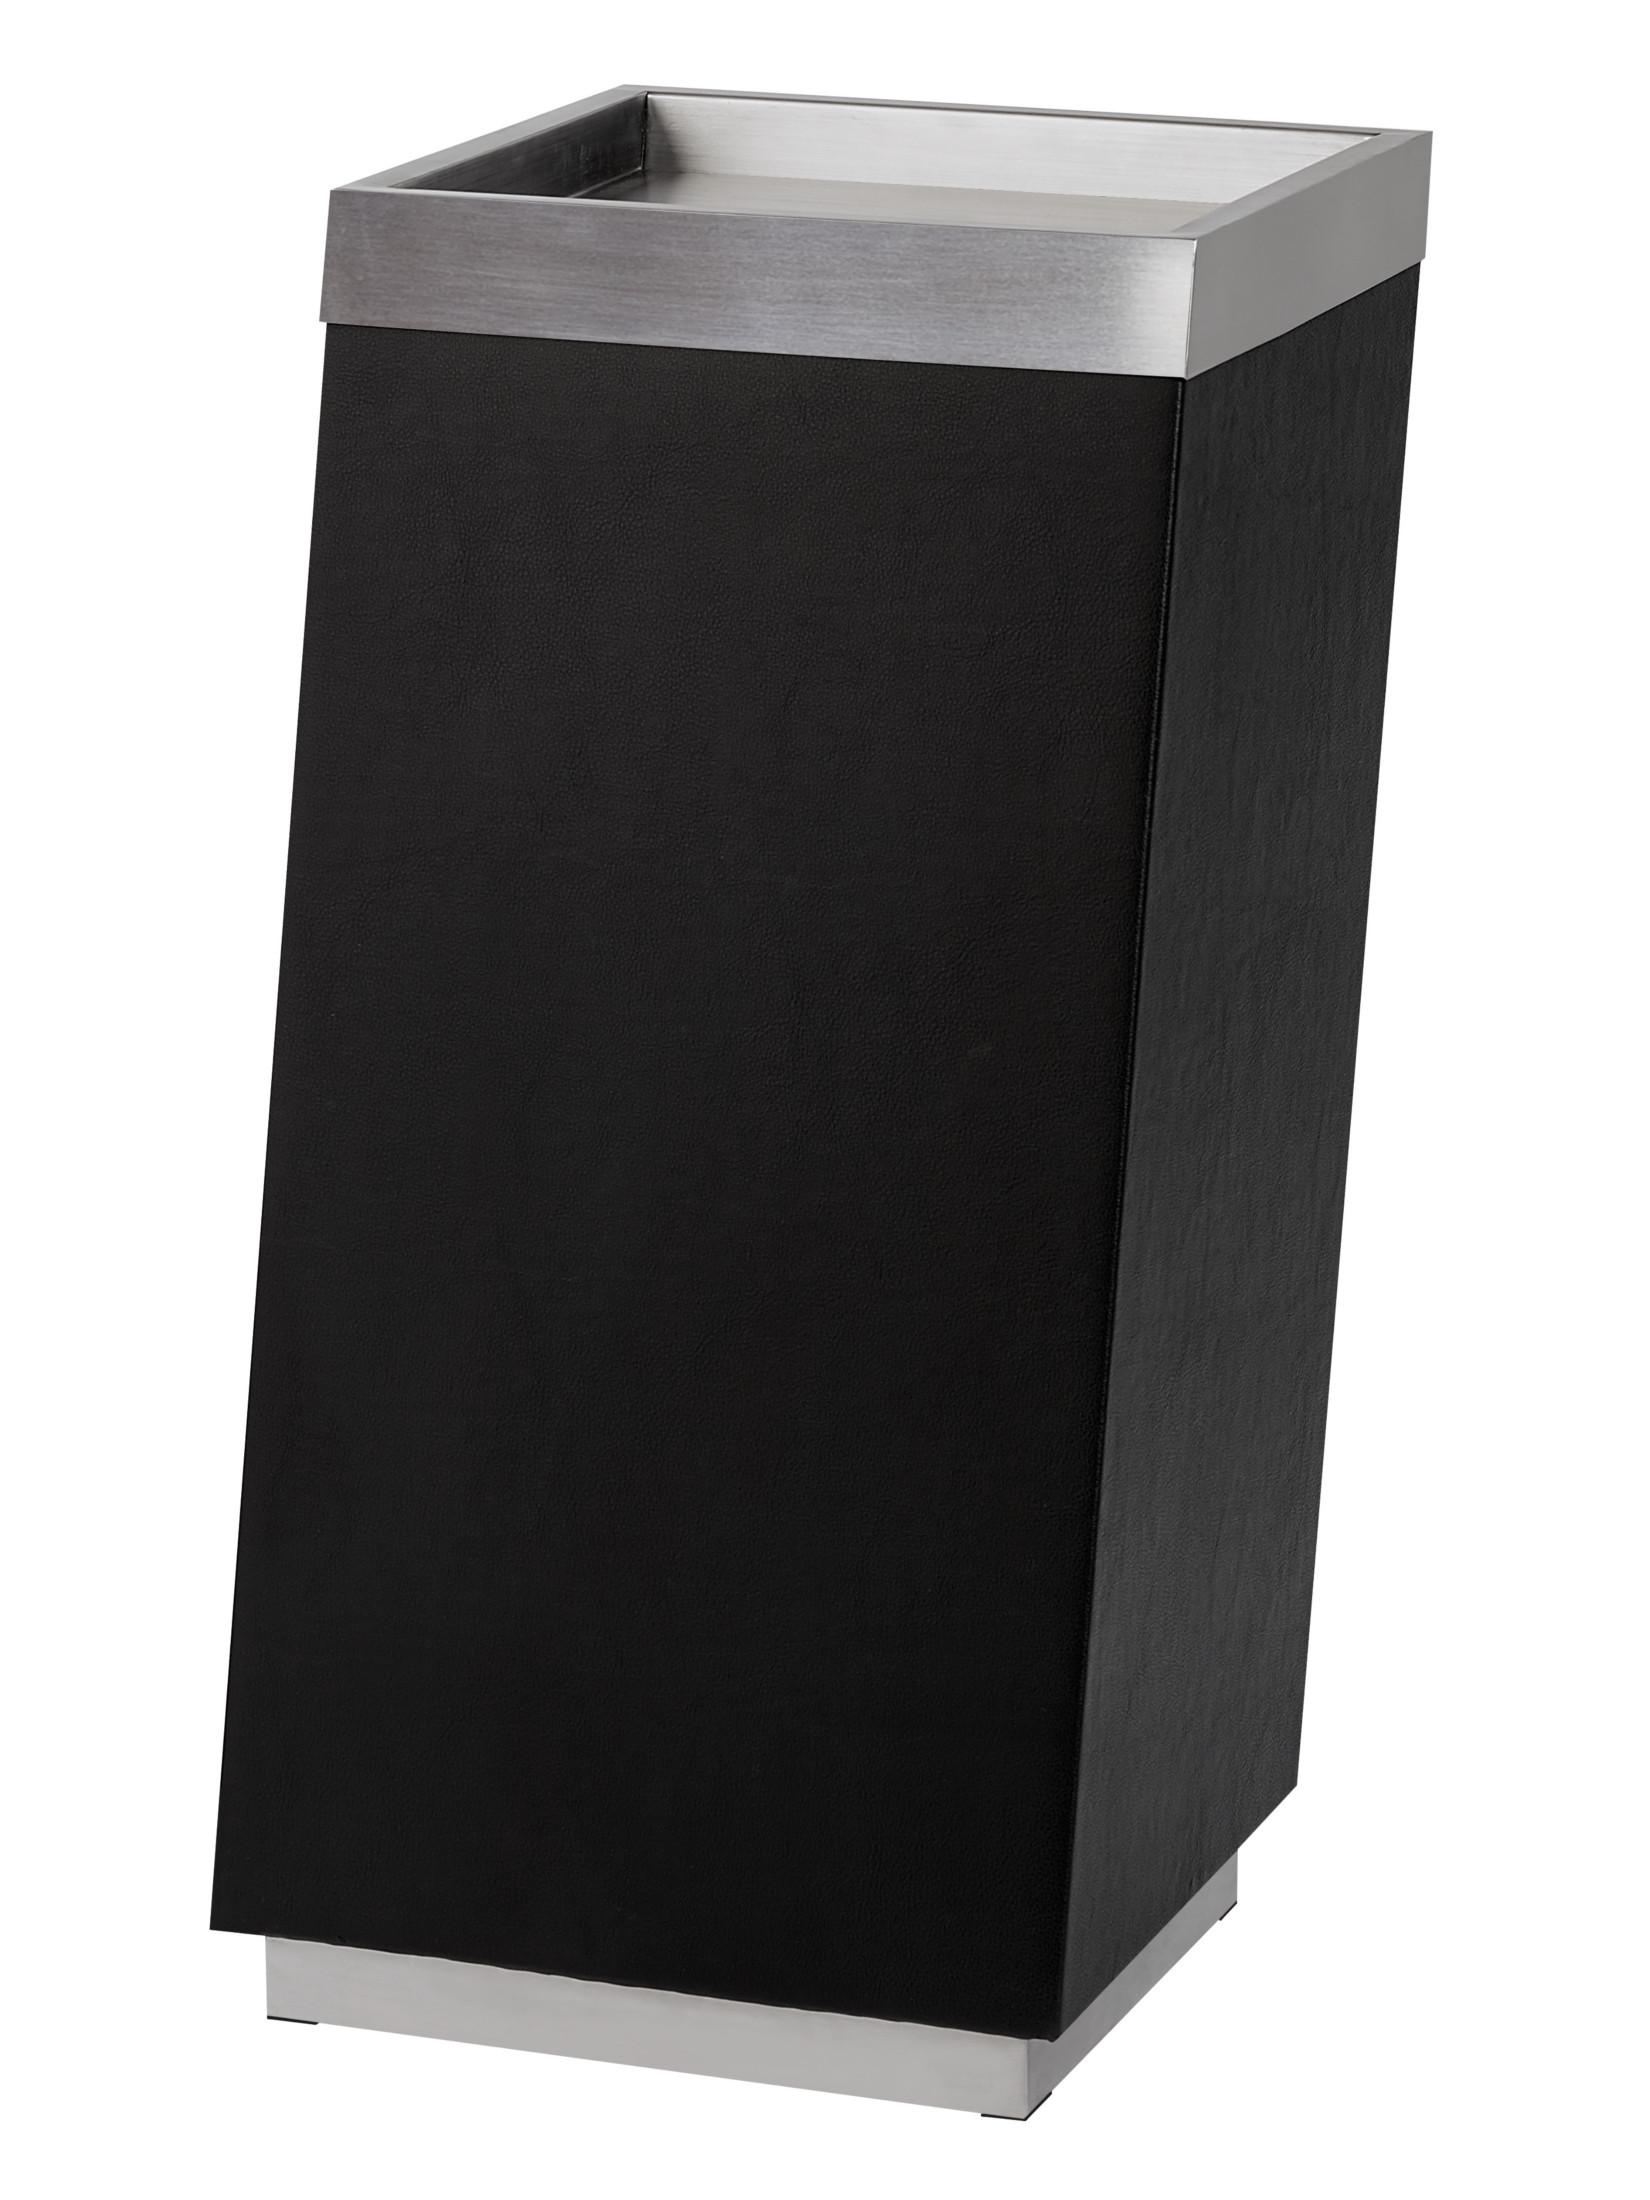 Odkládací stolek Sibel Intercalario - černé dřevo (0190500) + DÁREK ZDARMA